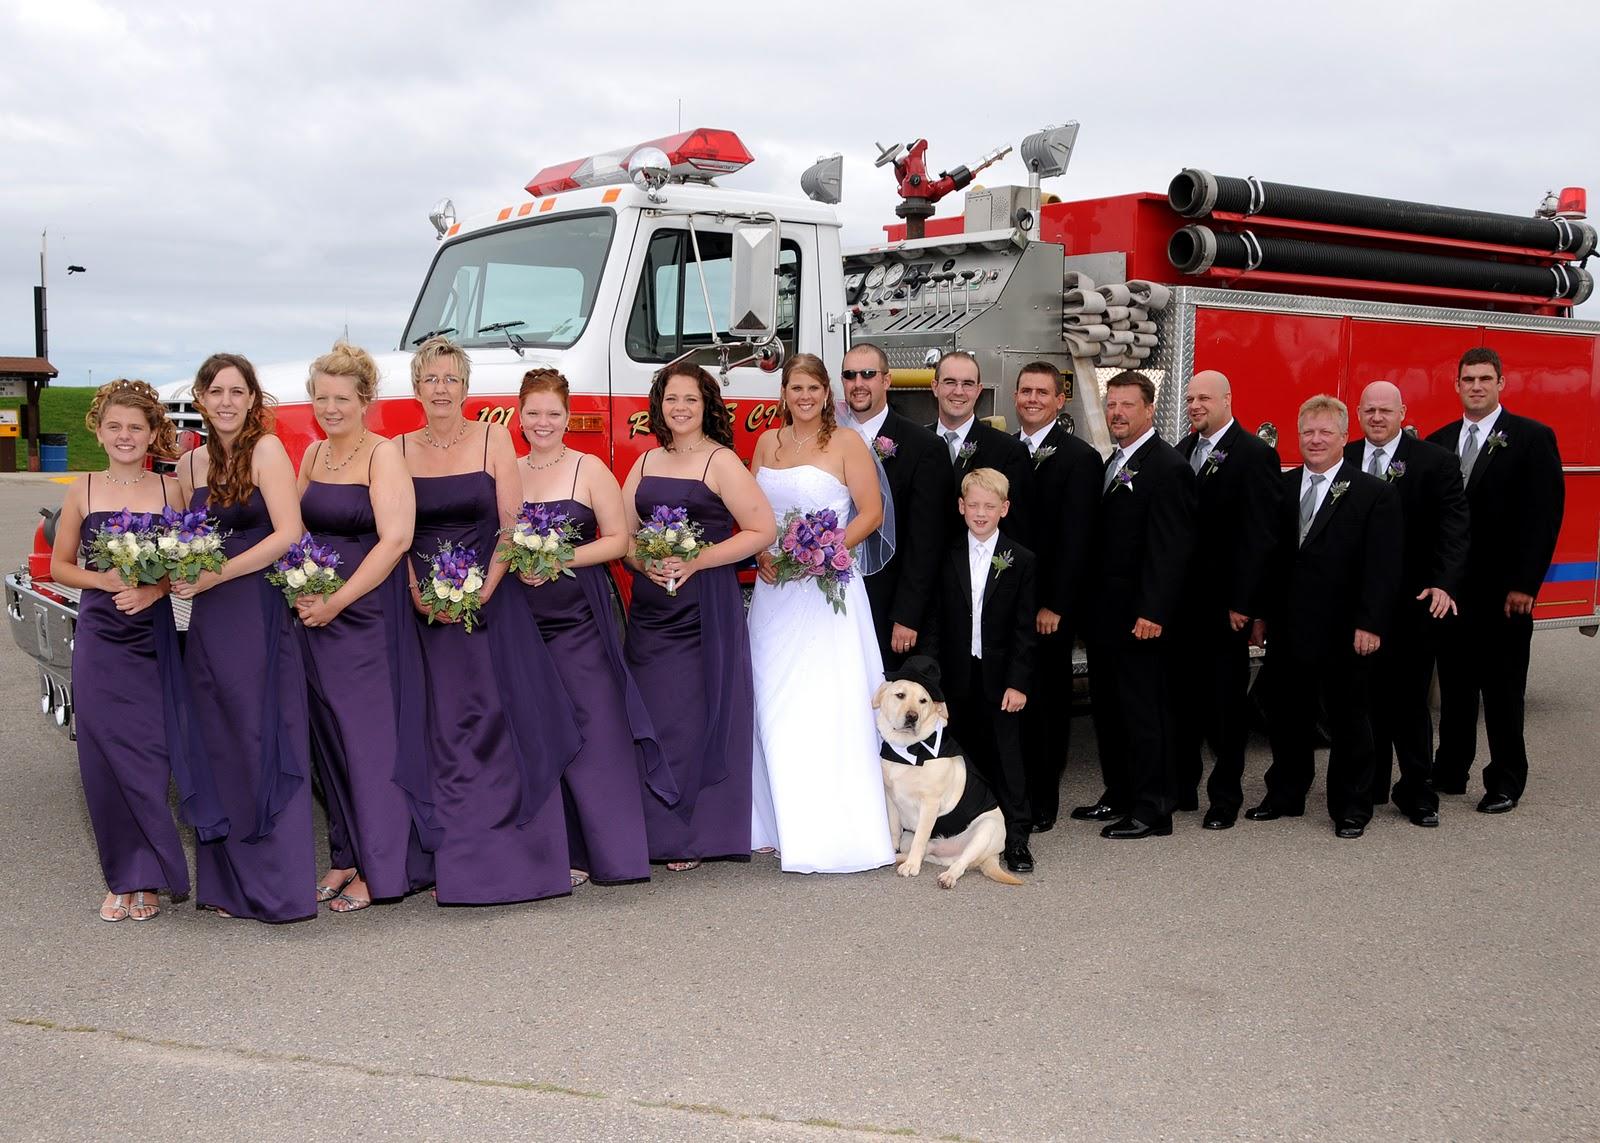 Fire Department Wedding  Ashley Skowronek